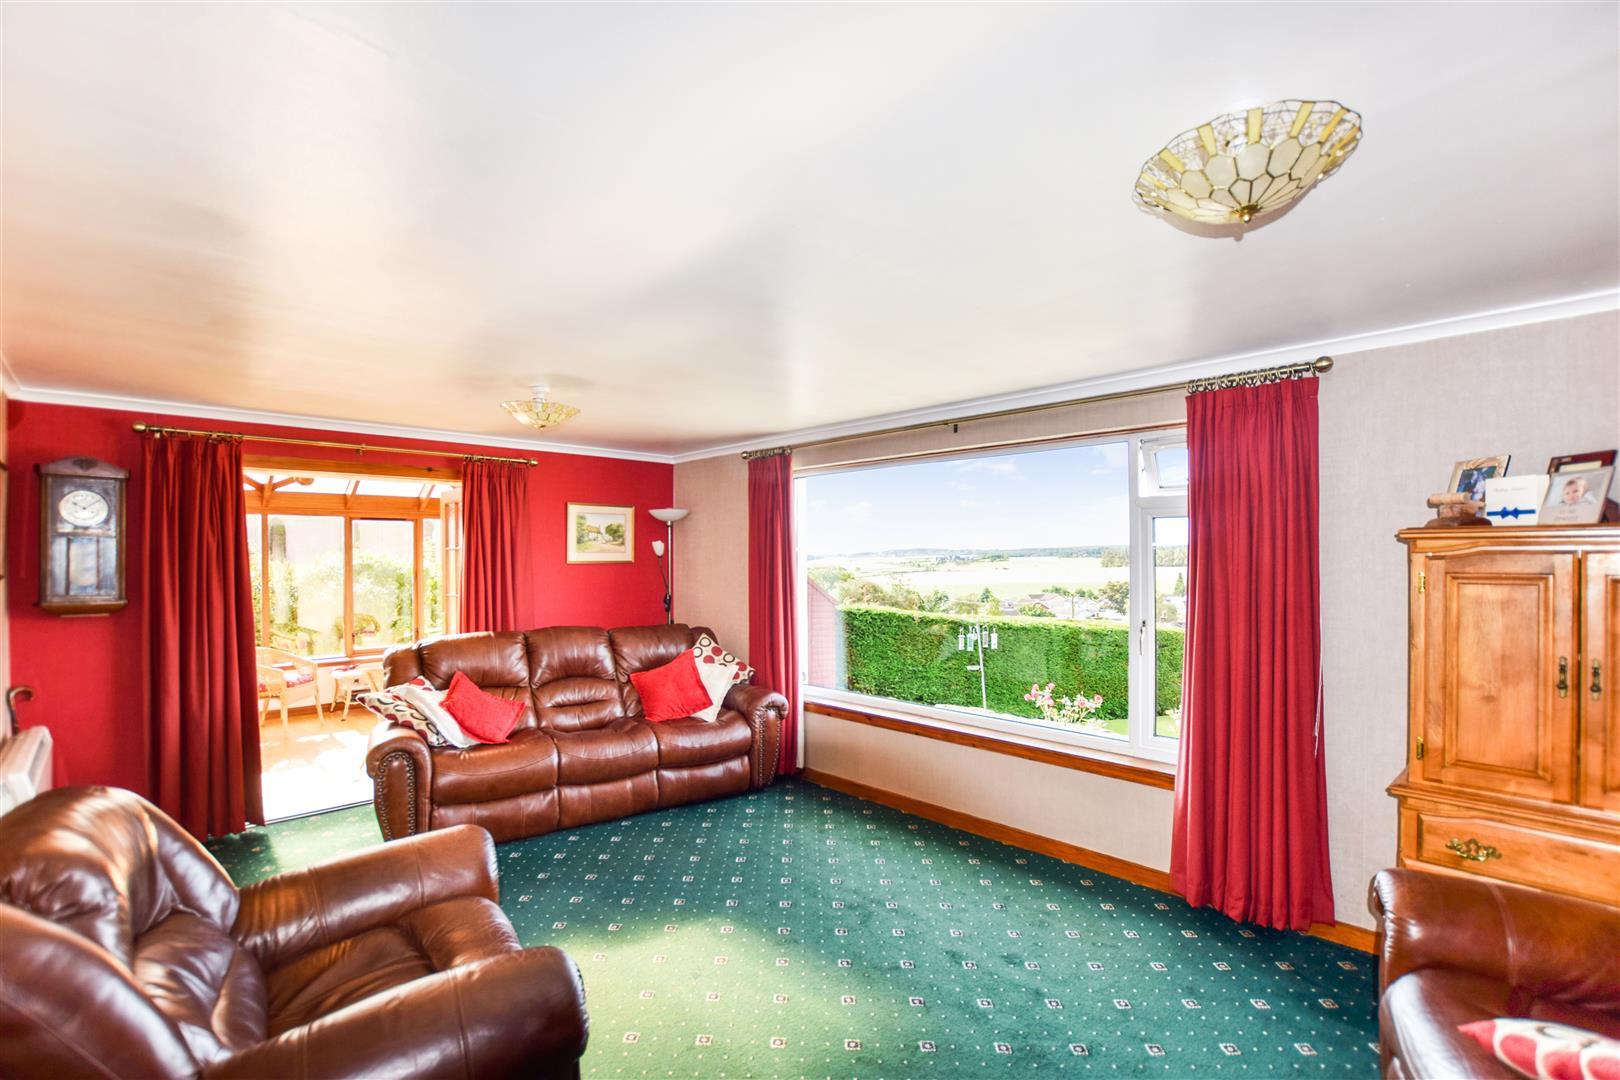 Lorneville, Highfield Place, Bankfoot, Perthshire, PH1 4AX, UK